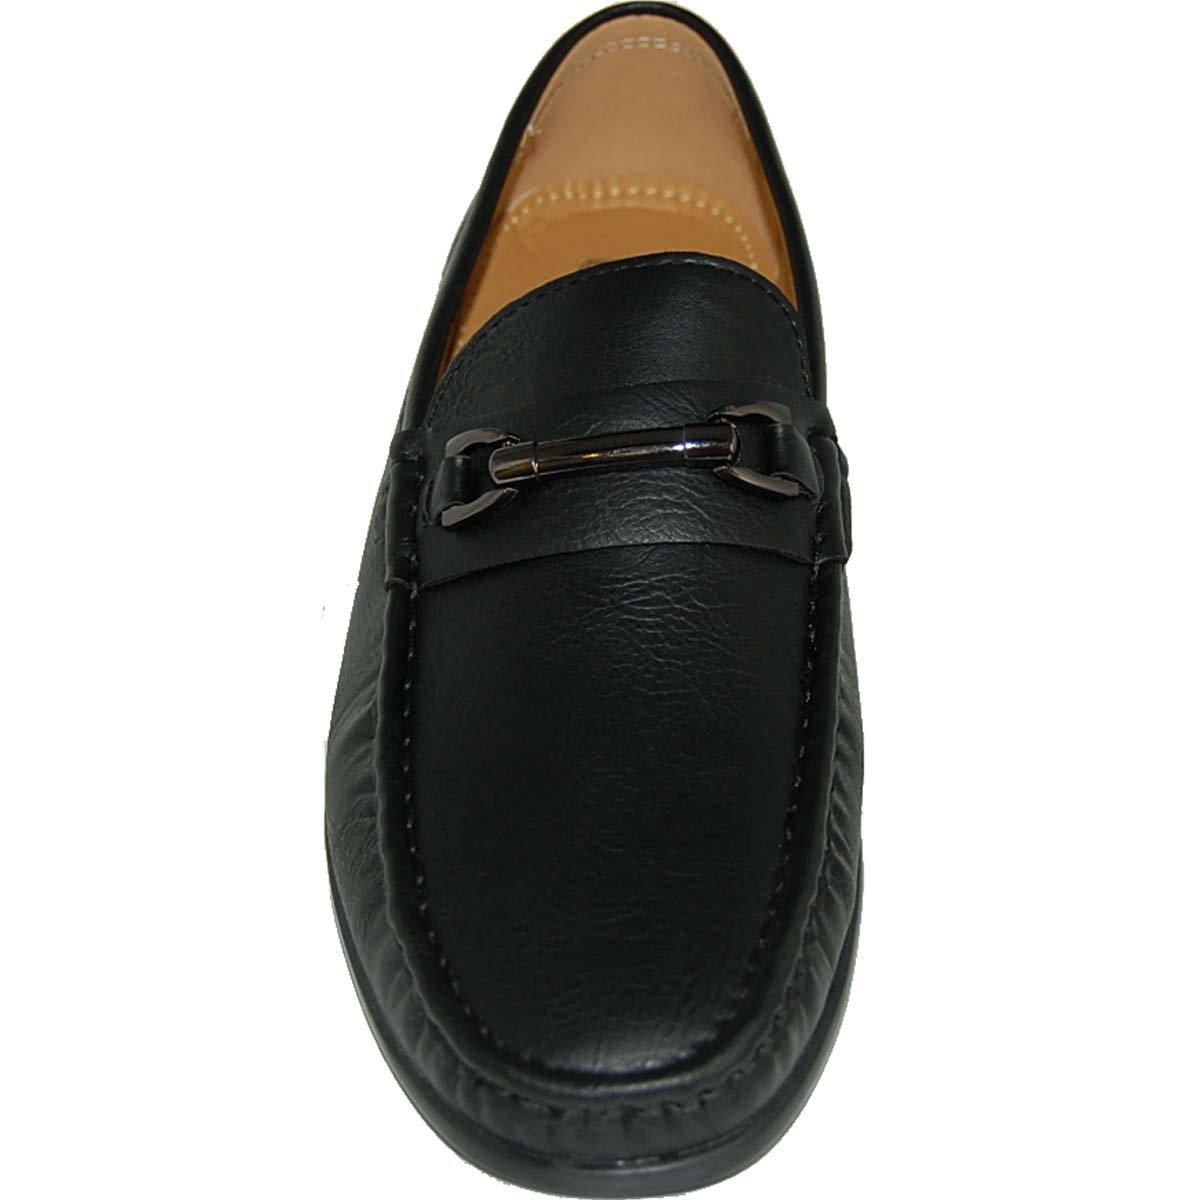 Shoe Artists High Level Black Loafers